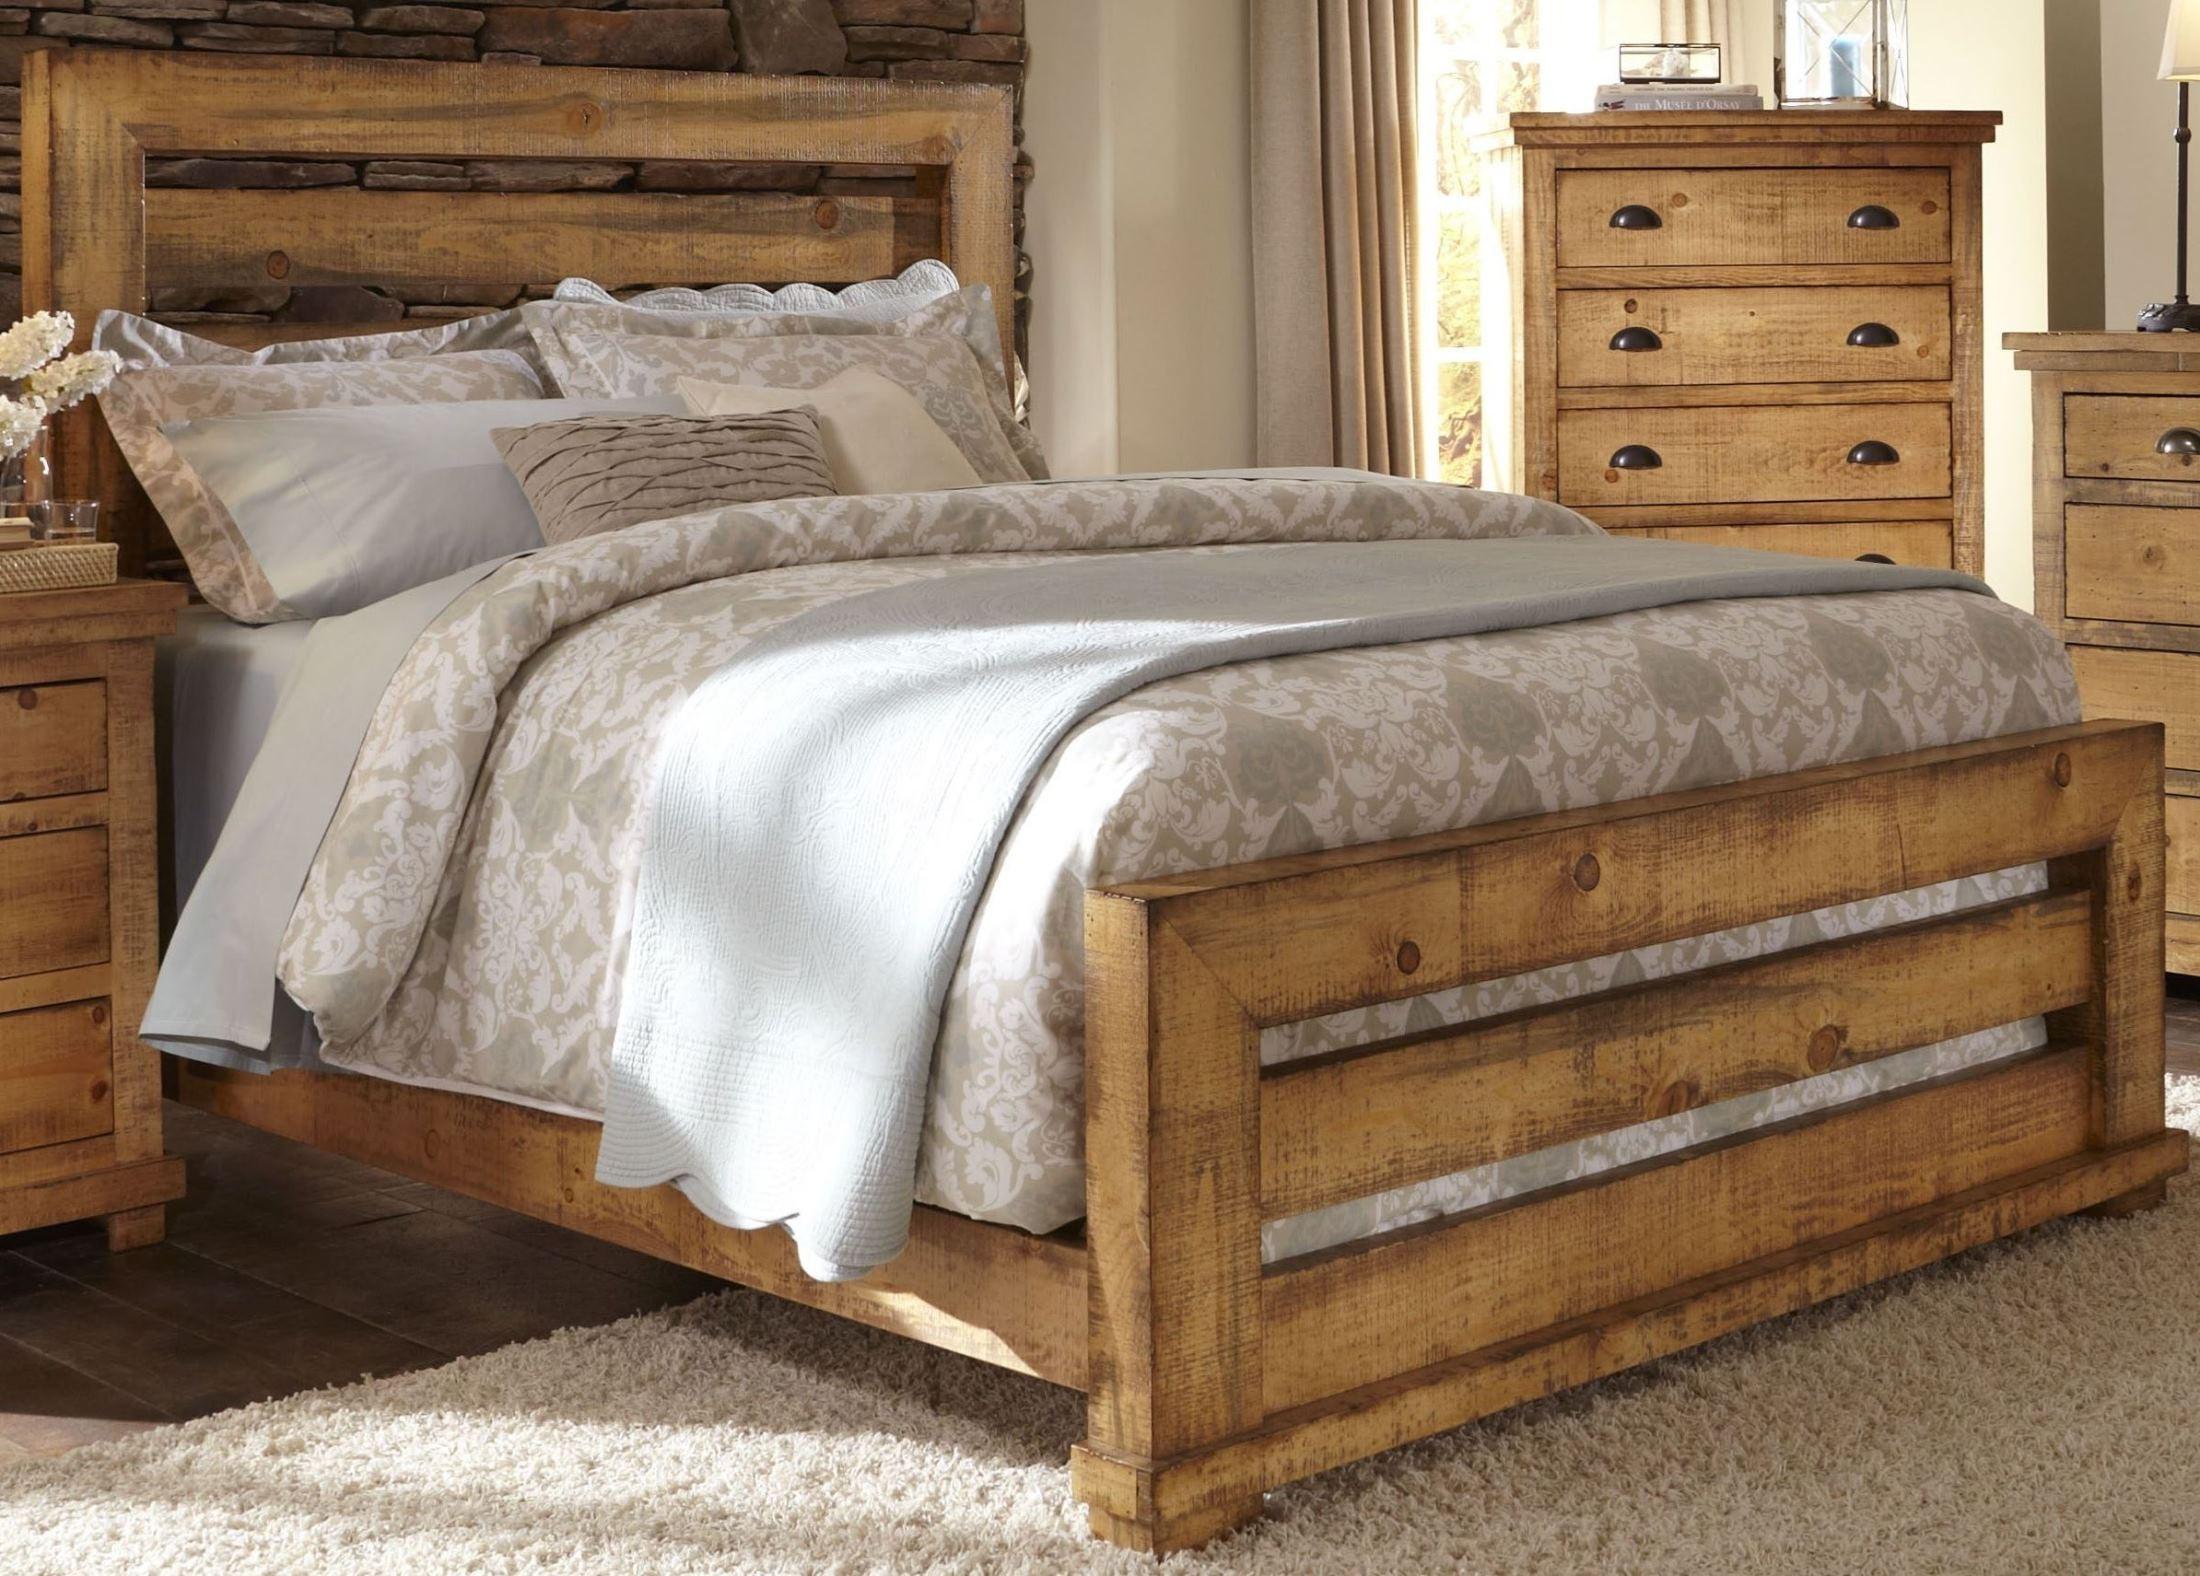 Willow Distressed Pine Slat Bedroom Set P608 60 61 78 Progressive